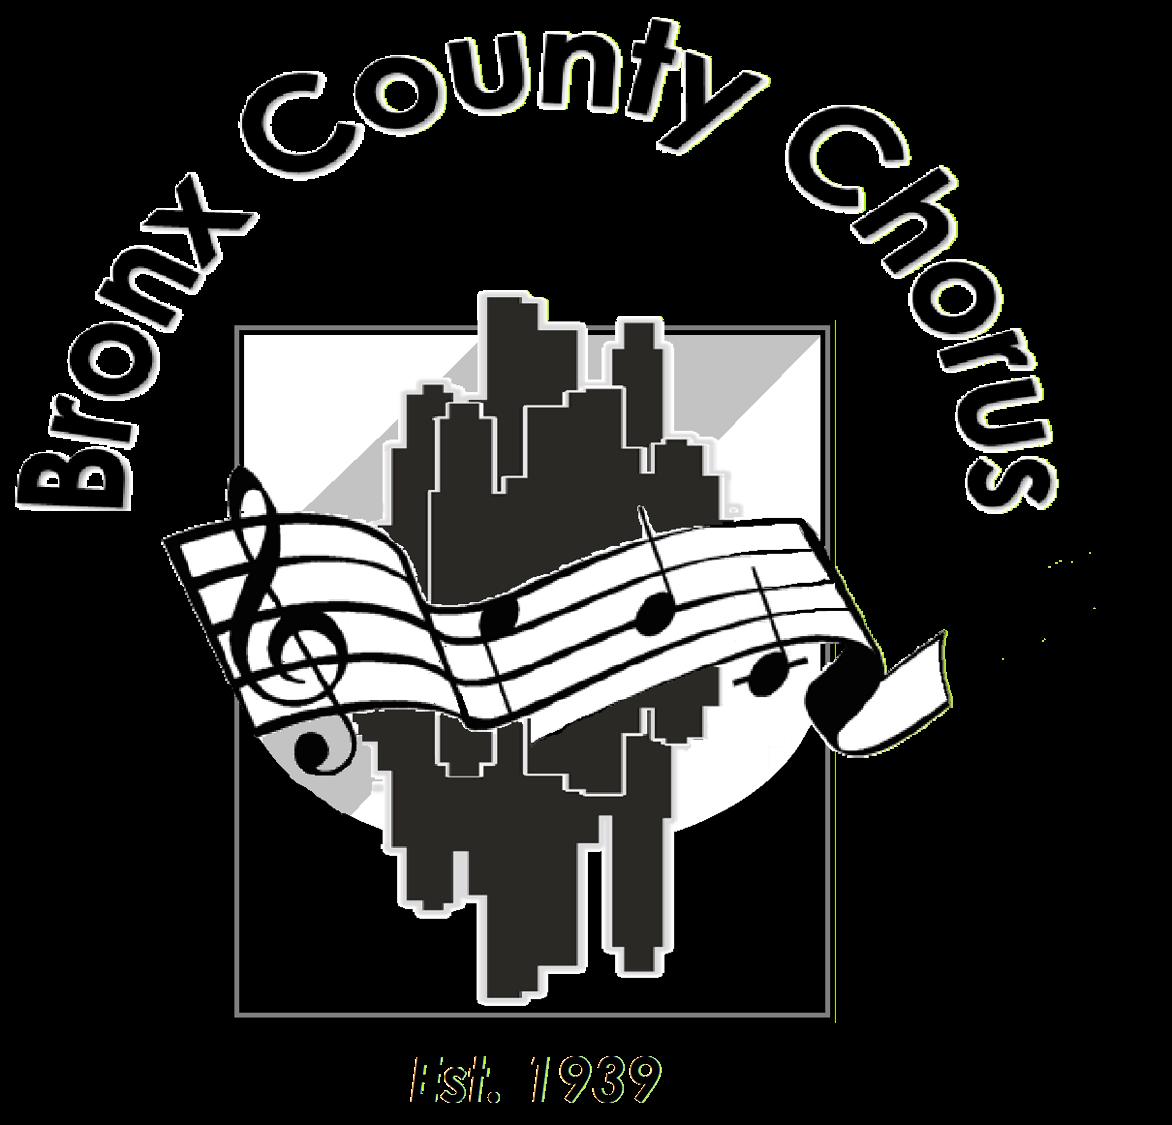 Bronx County Chorus